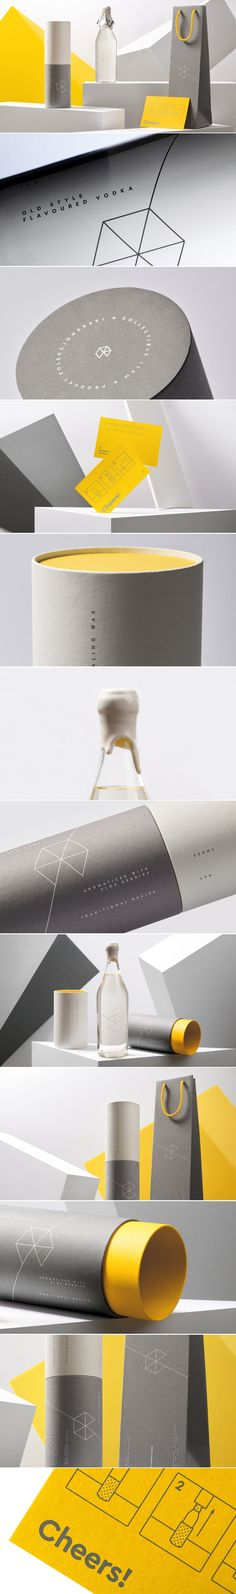 How Redkroft Designed this Handmade Gift for Google's Warsaw Campus — The Dieline | Packaging & Branding Design & Innovation News